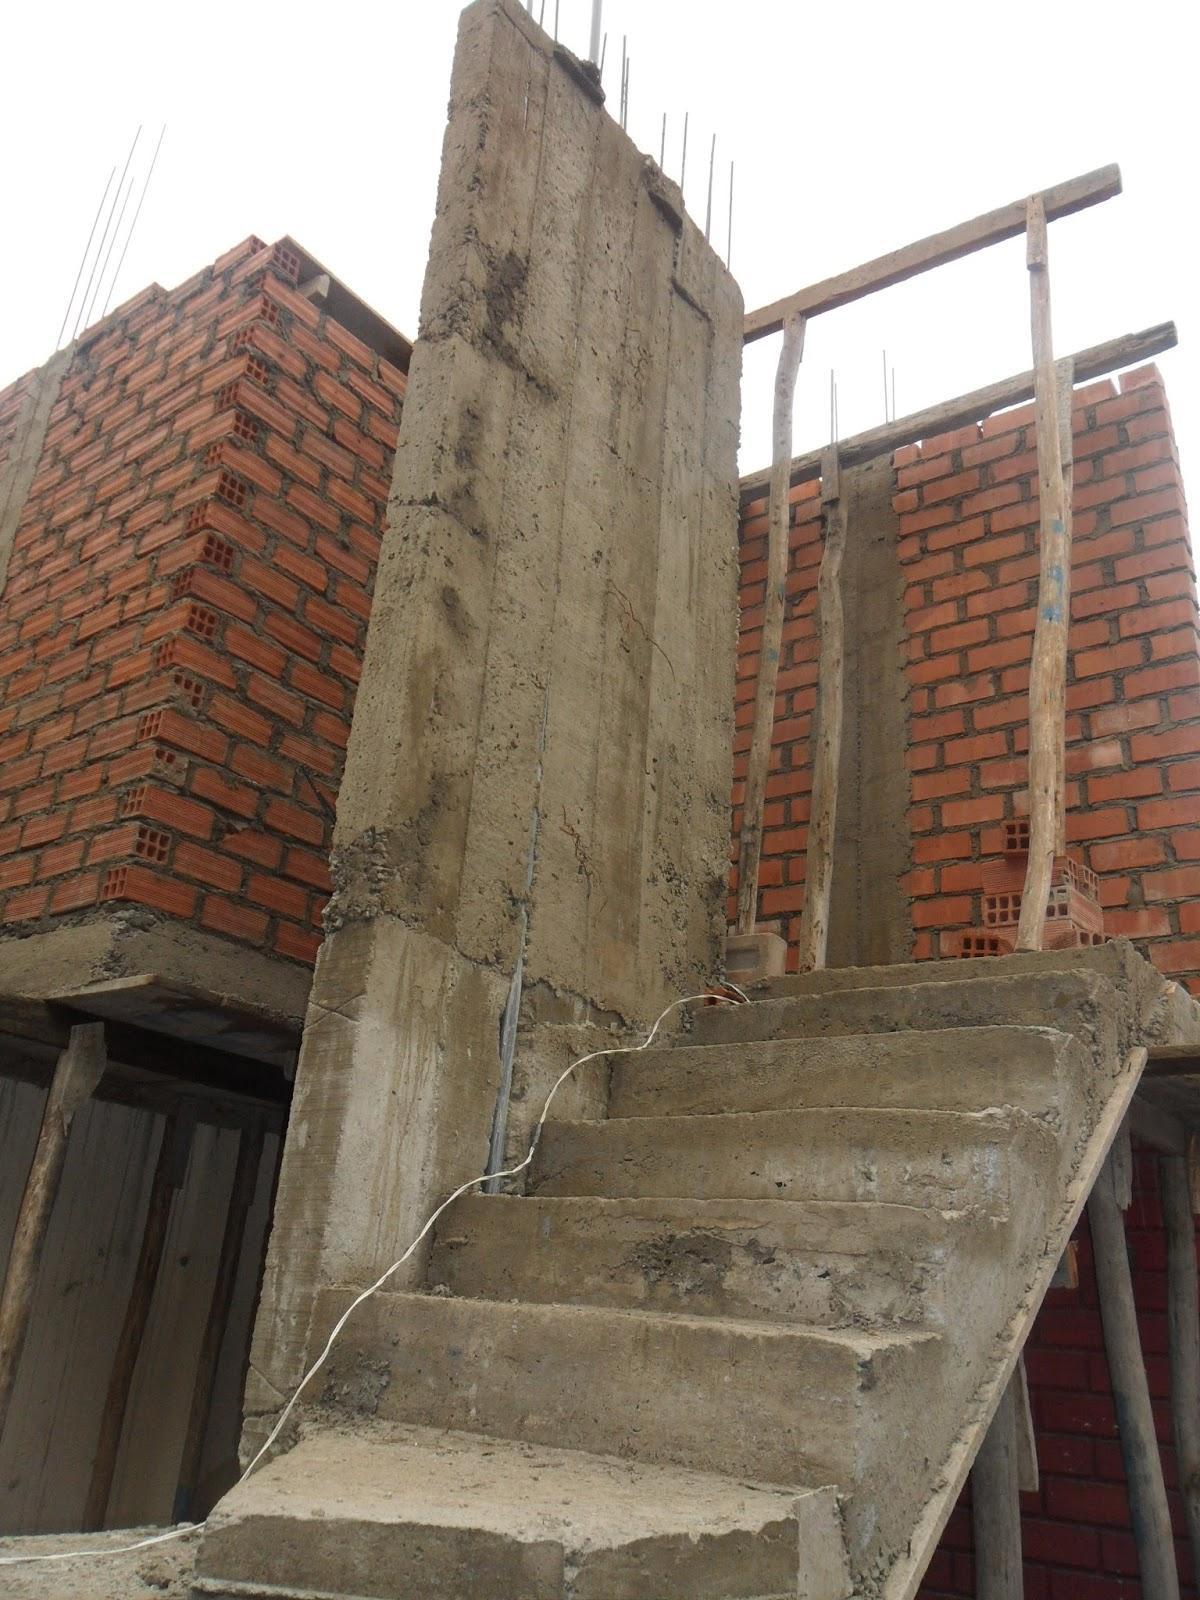 Cristian campos obra en proceso escaleras y ampliaci n - Escalera exterior para segundo piso ...